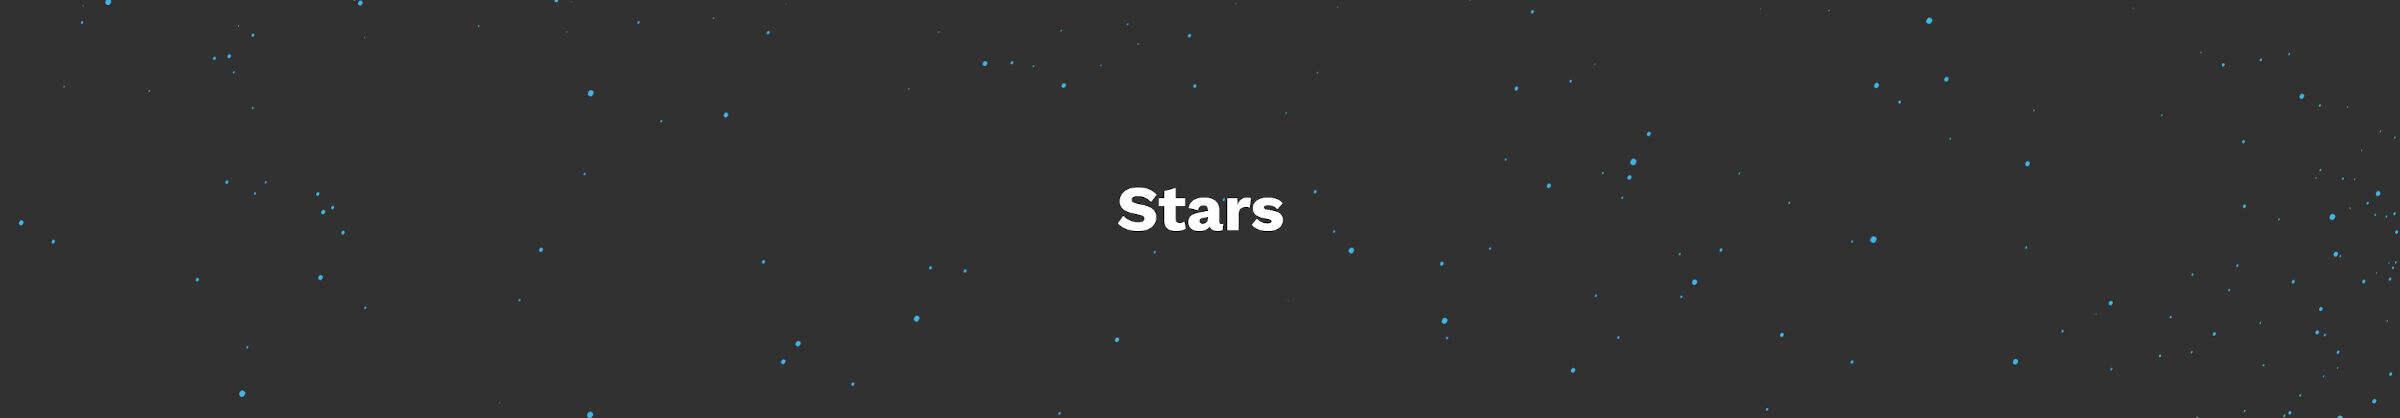 stars动画效果